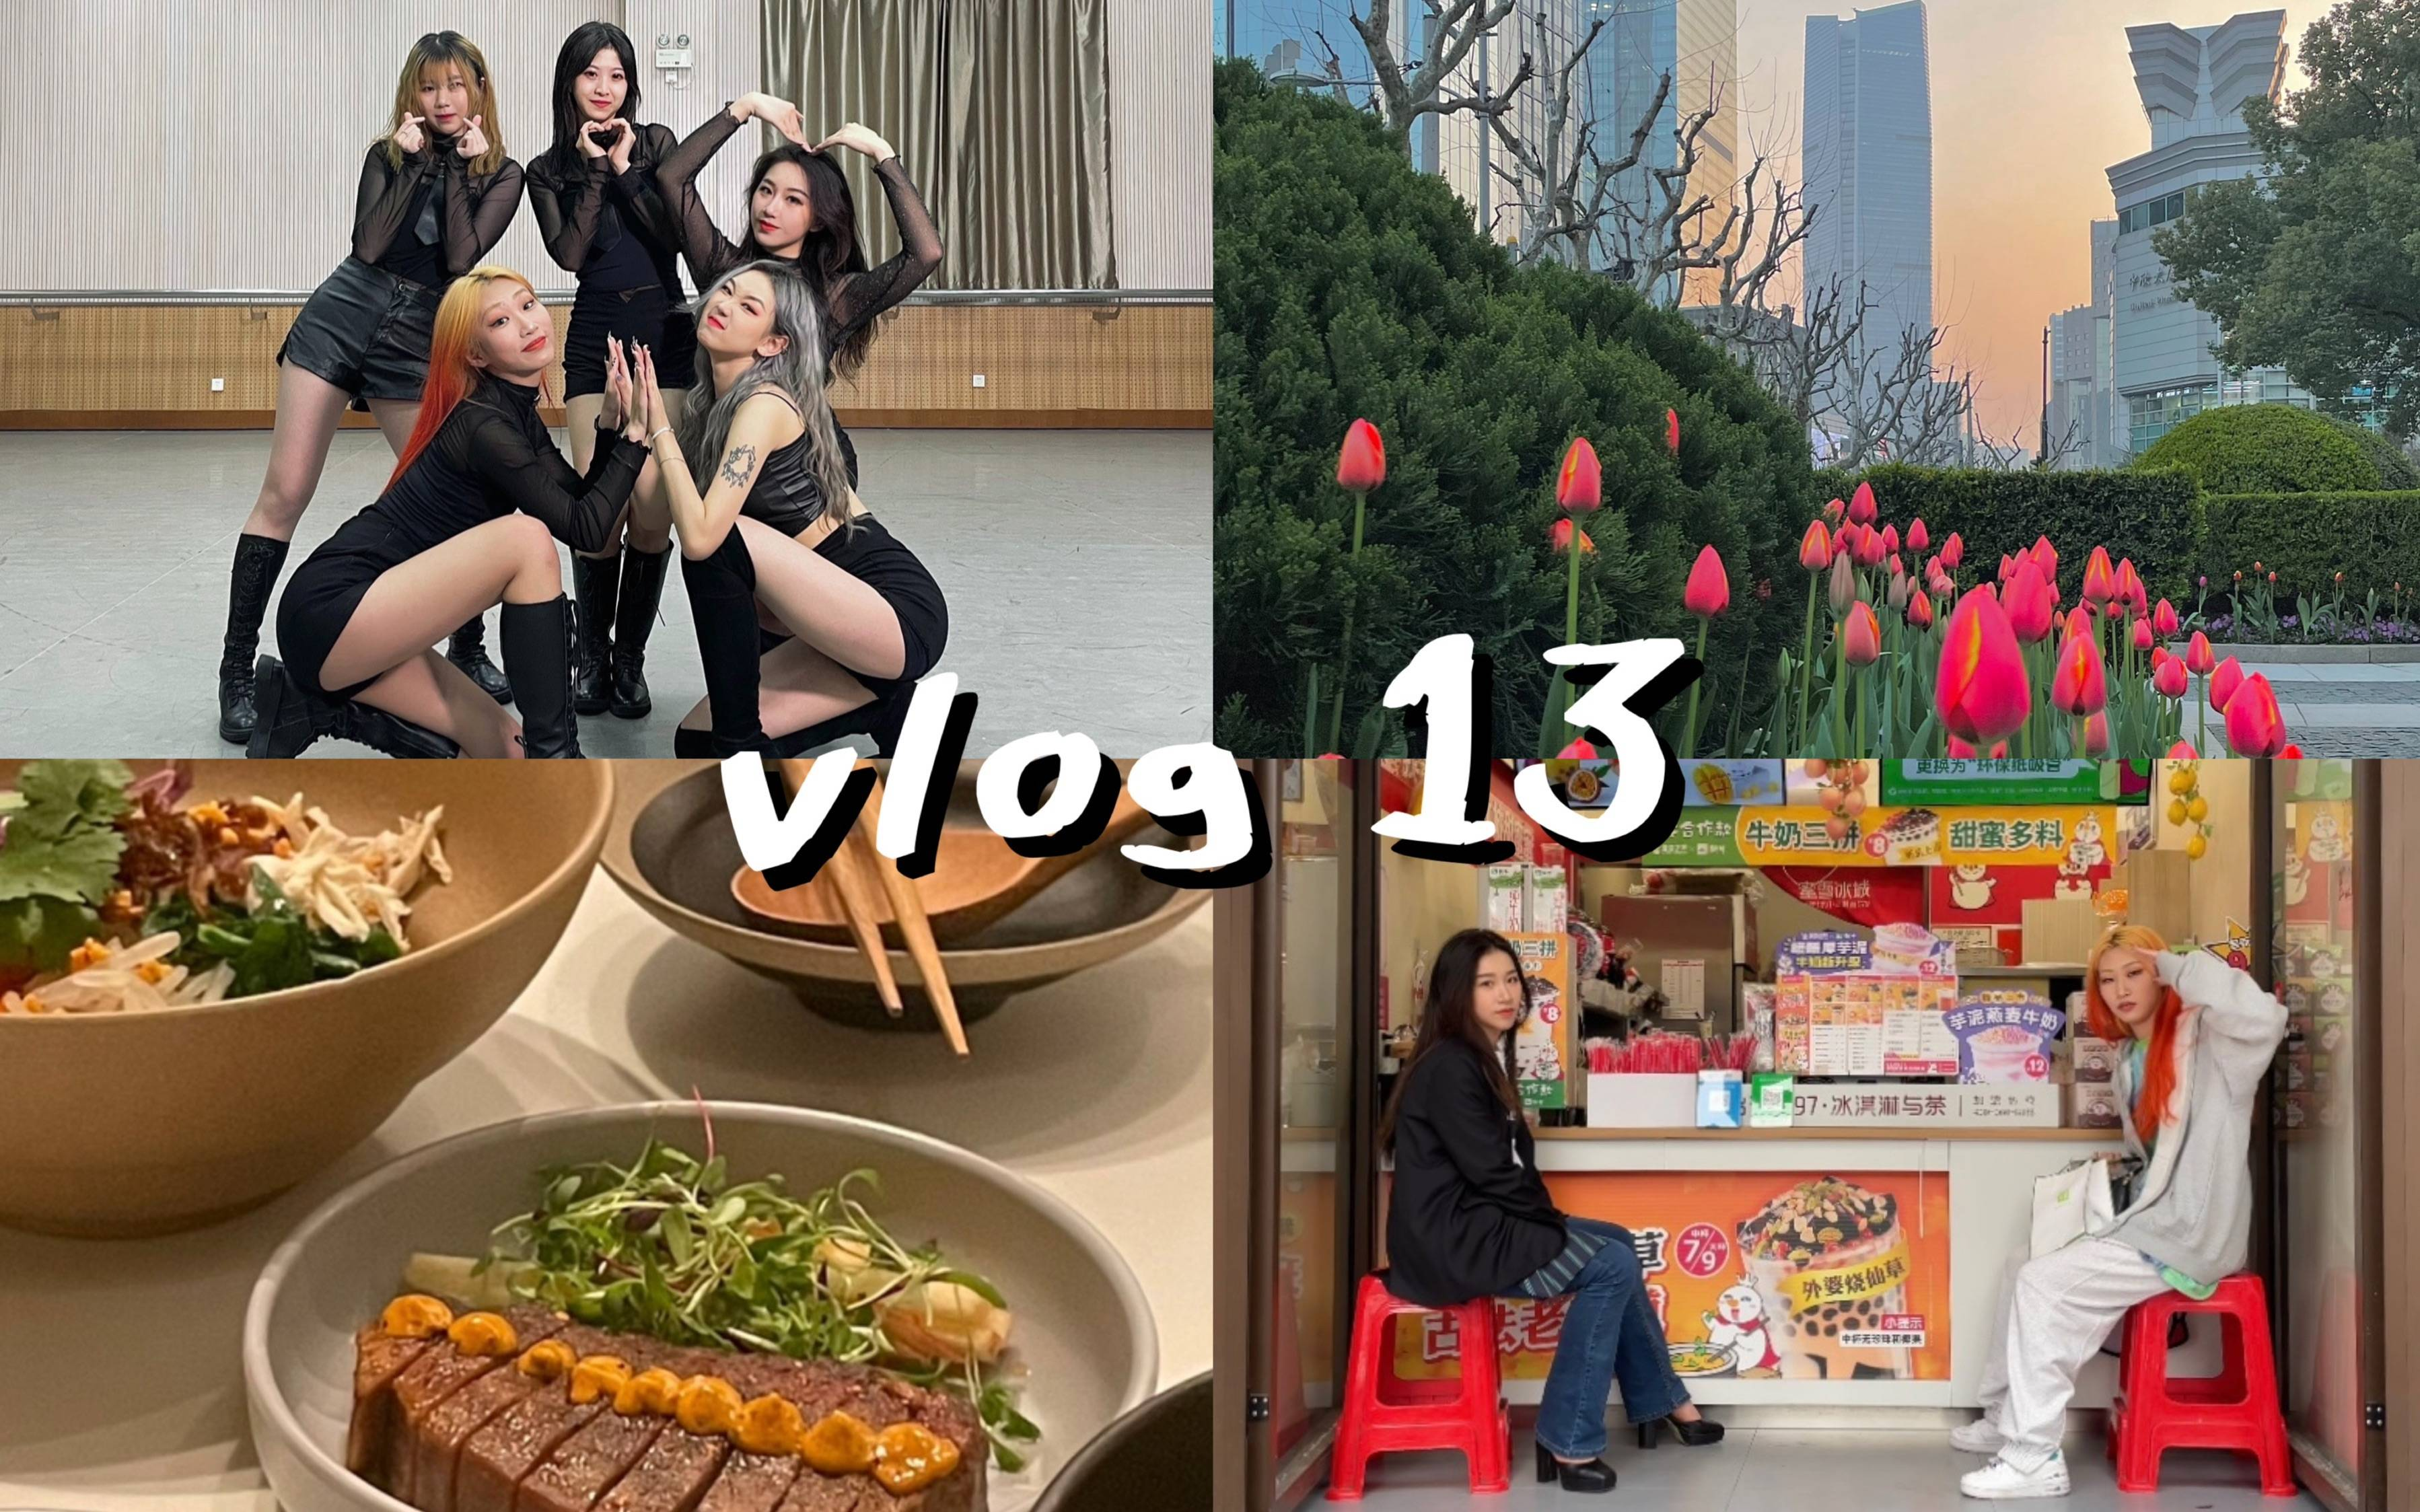 VLOG13♡翻跳宣美Tail的爆笑幕后花絮 feat.一些校园生活片段 给朋友生日惊喜 早晚护肤流程分享